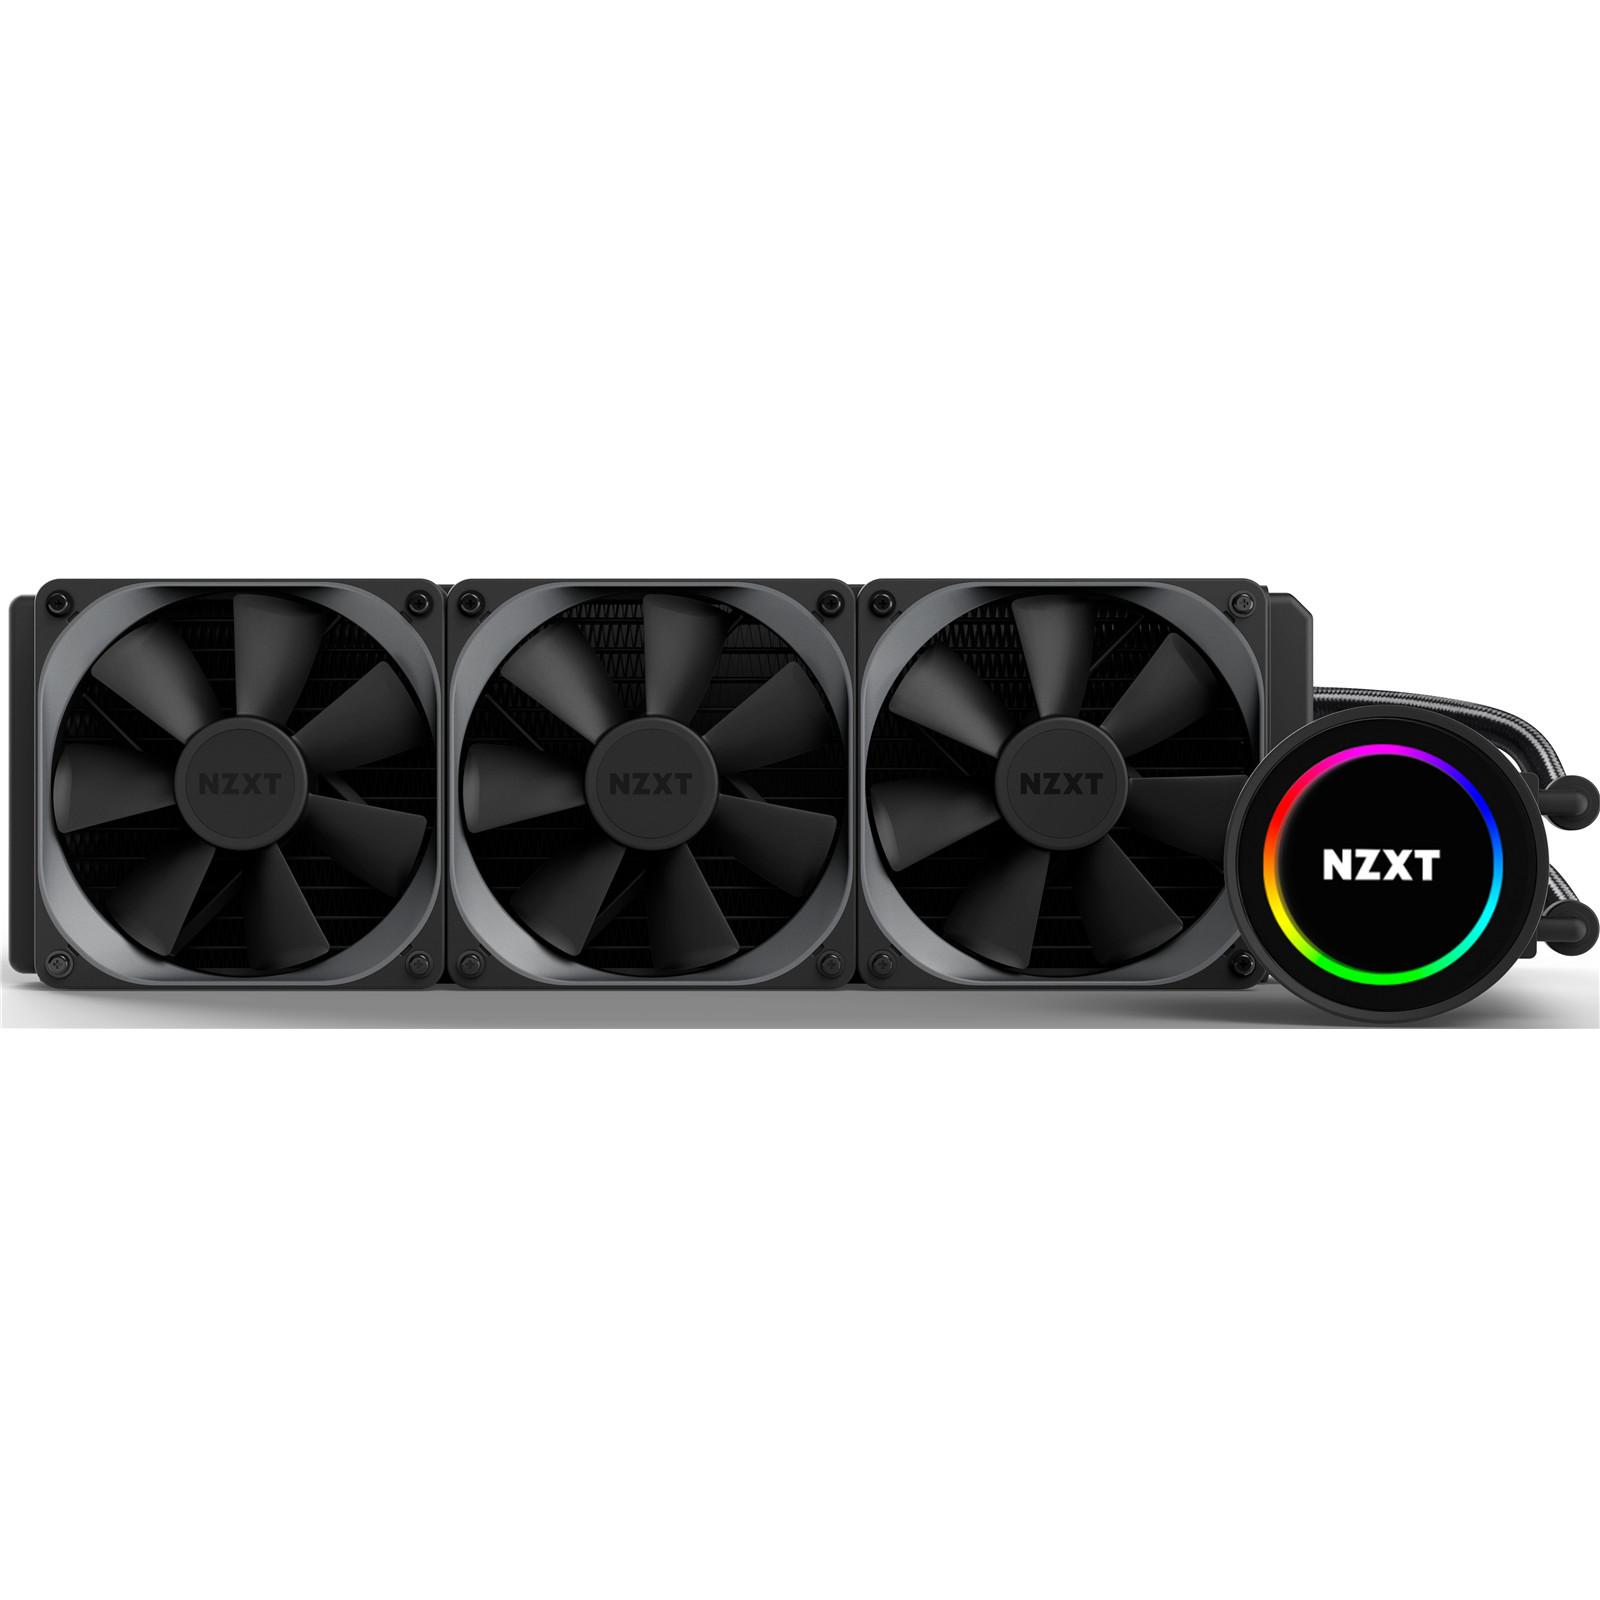 Buy the NZXT Kraken X72 All in one Liquid Cooler High-Performance, 360MM  RGB     ( RL-KRX72-01 ) online